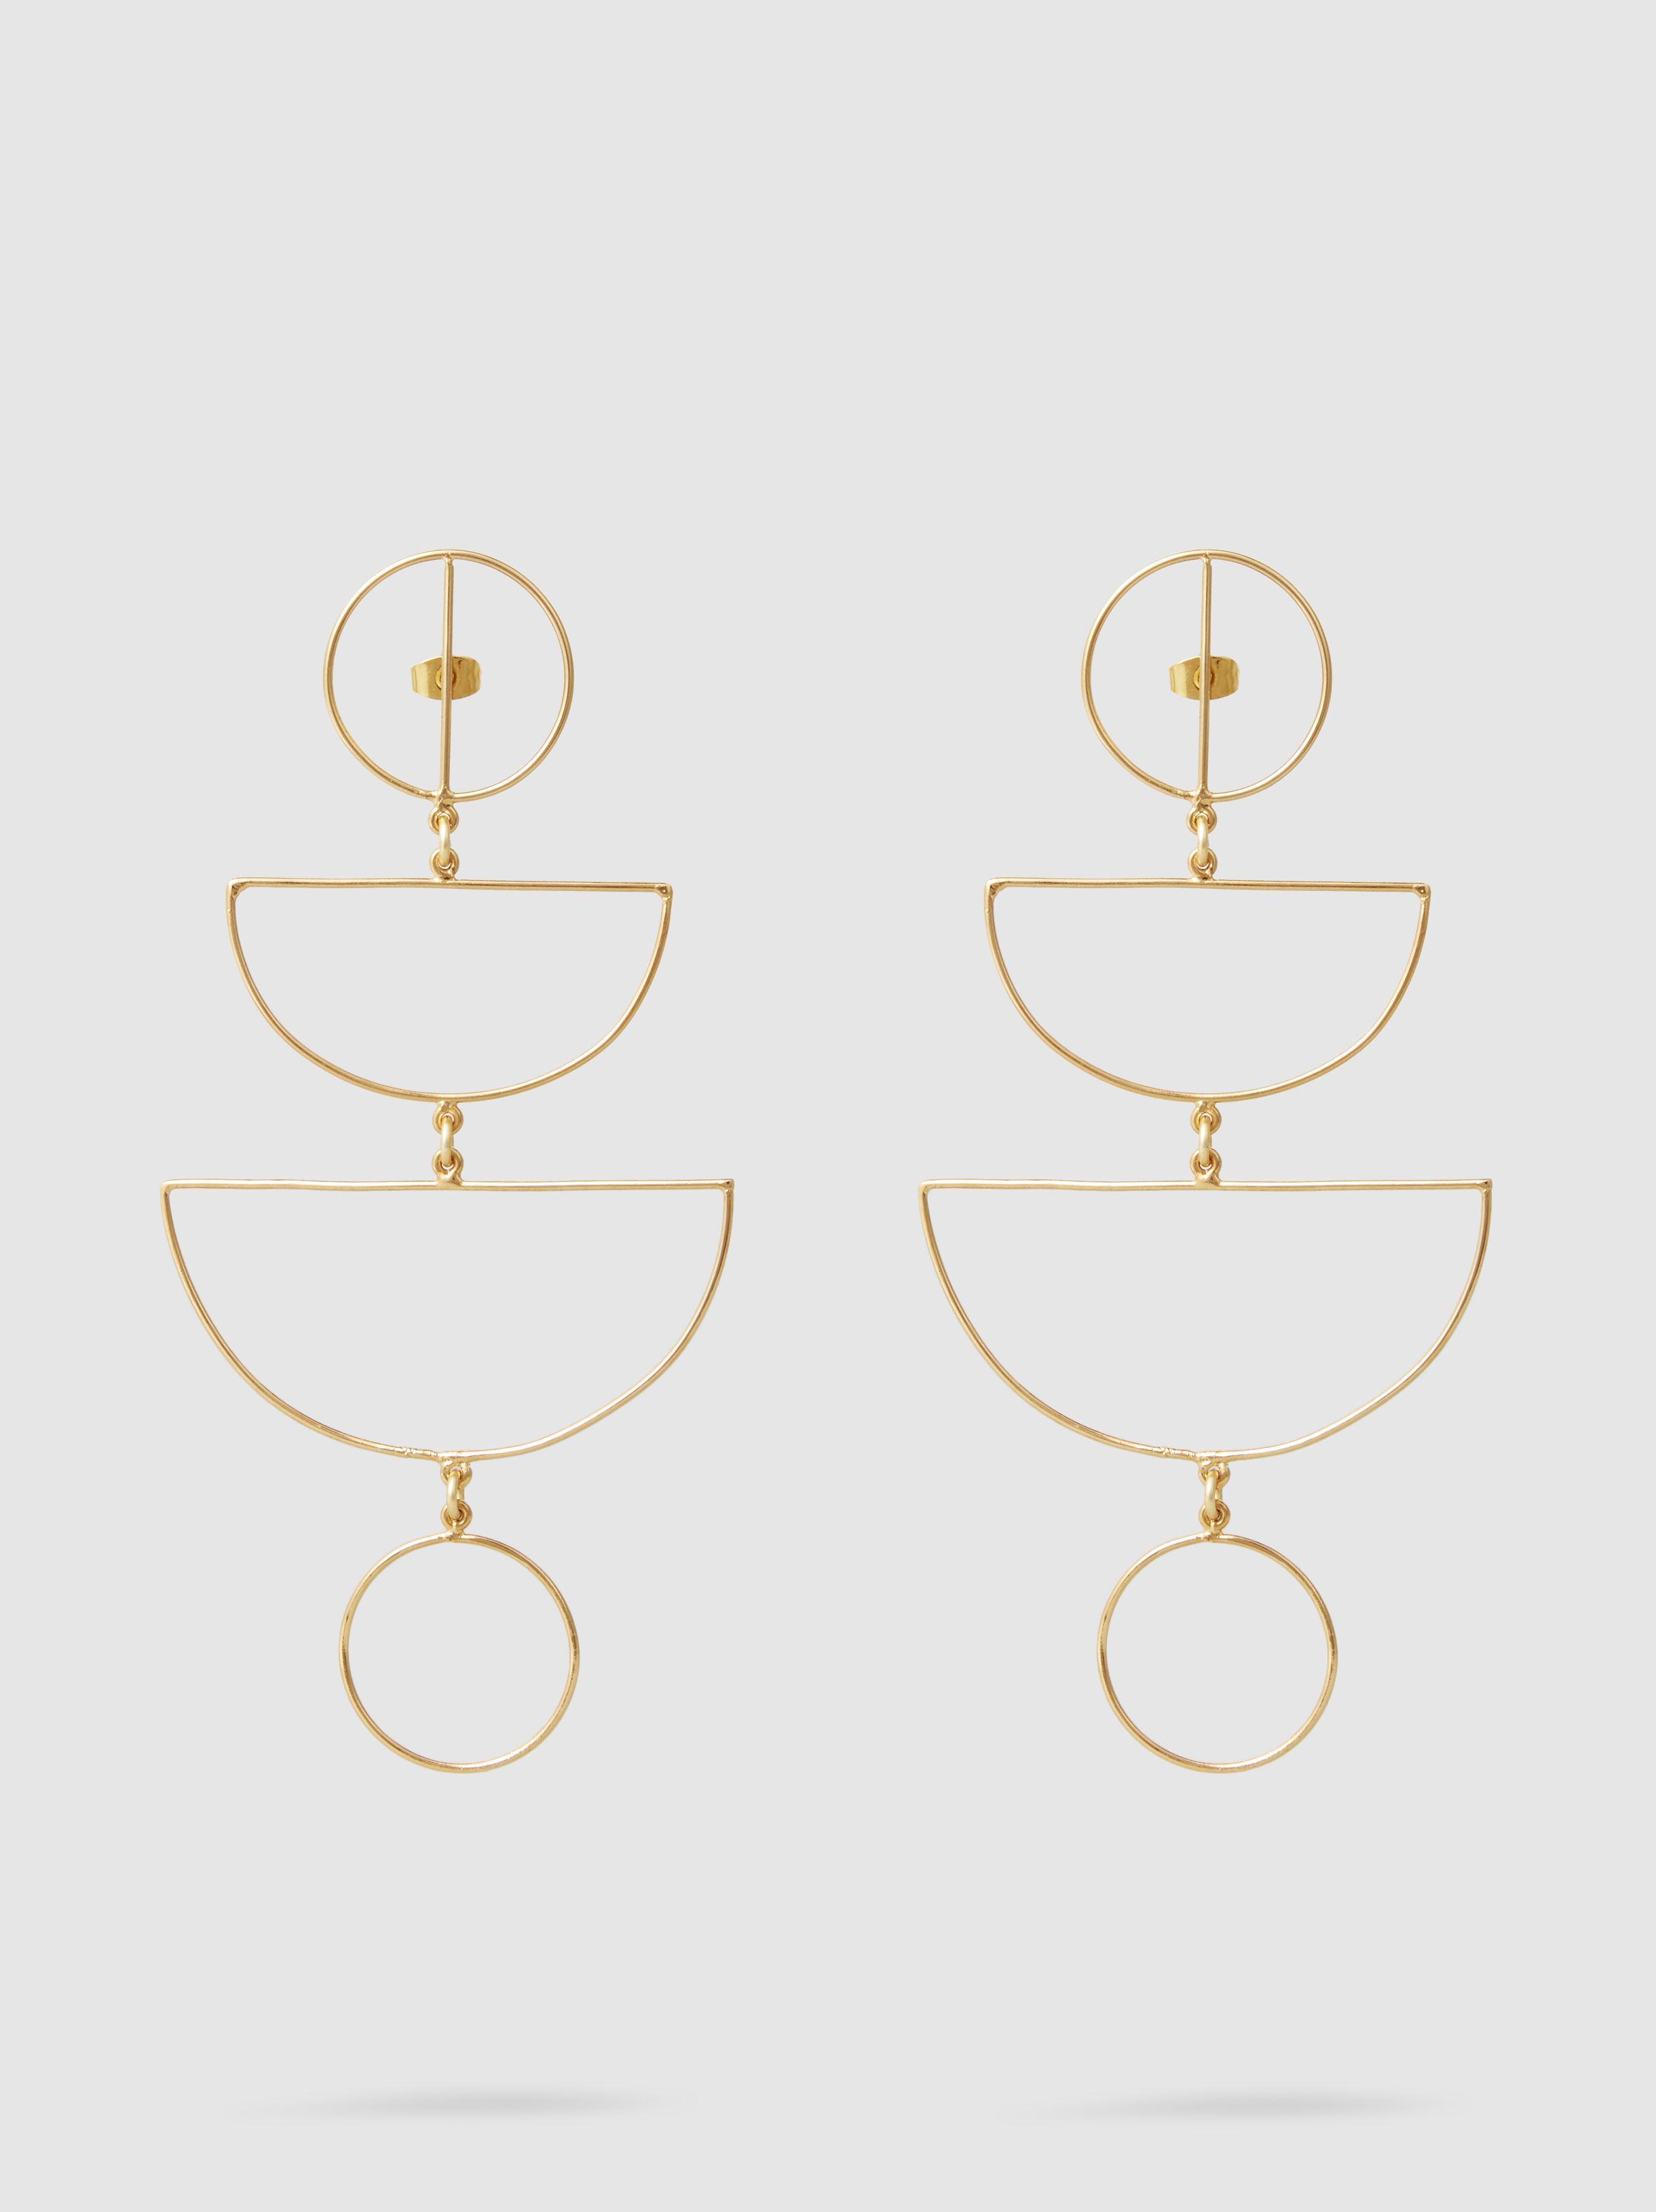 Mercedes Salazar Juego Gold-Tone Earrings lWHdG7